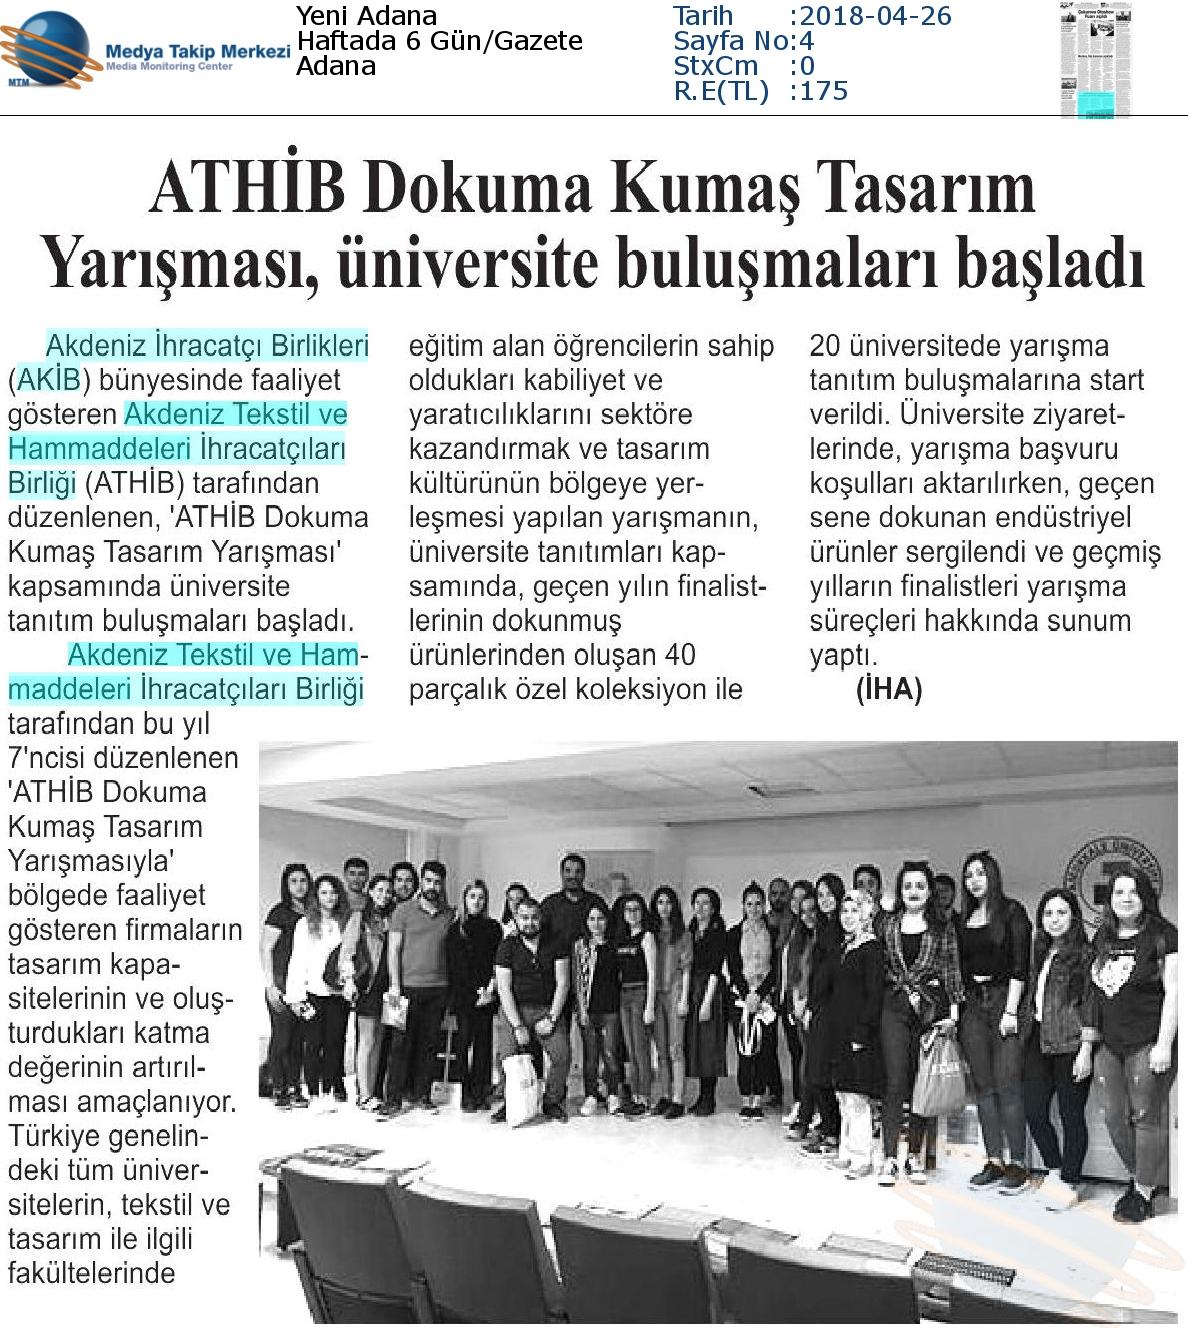 Yeni_Adana-ATHİB_DOKUMA_KUMAŞ_TASARIM_YARIŞMASI,_ÜNİVERSİTE_BULUŞMALARI_BAŞLADI-26.04.2018